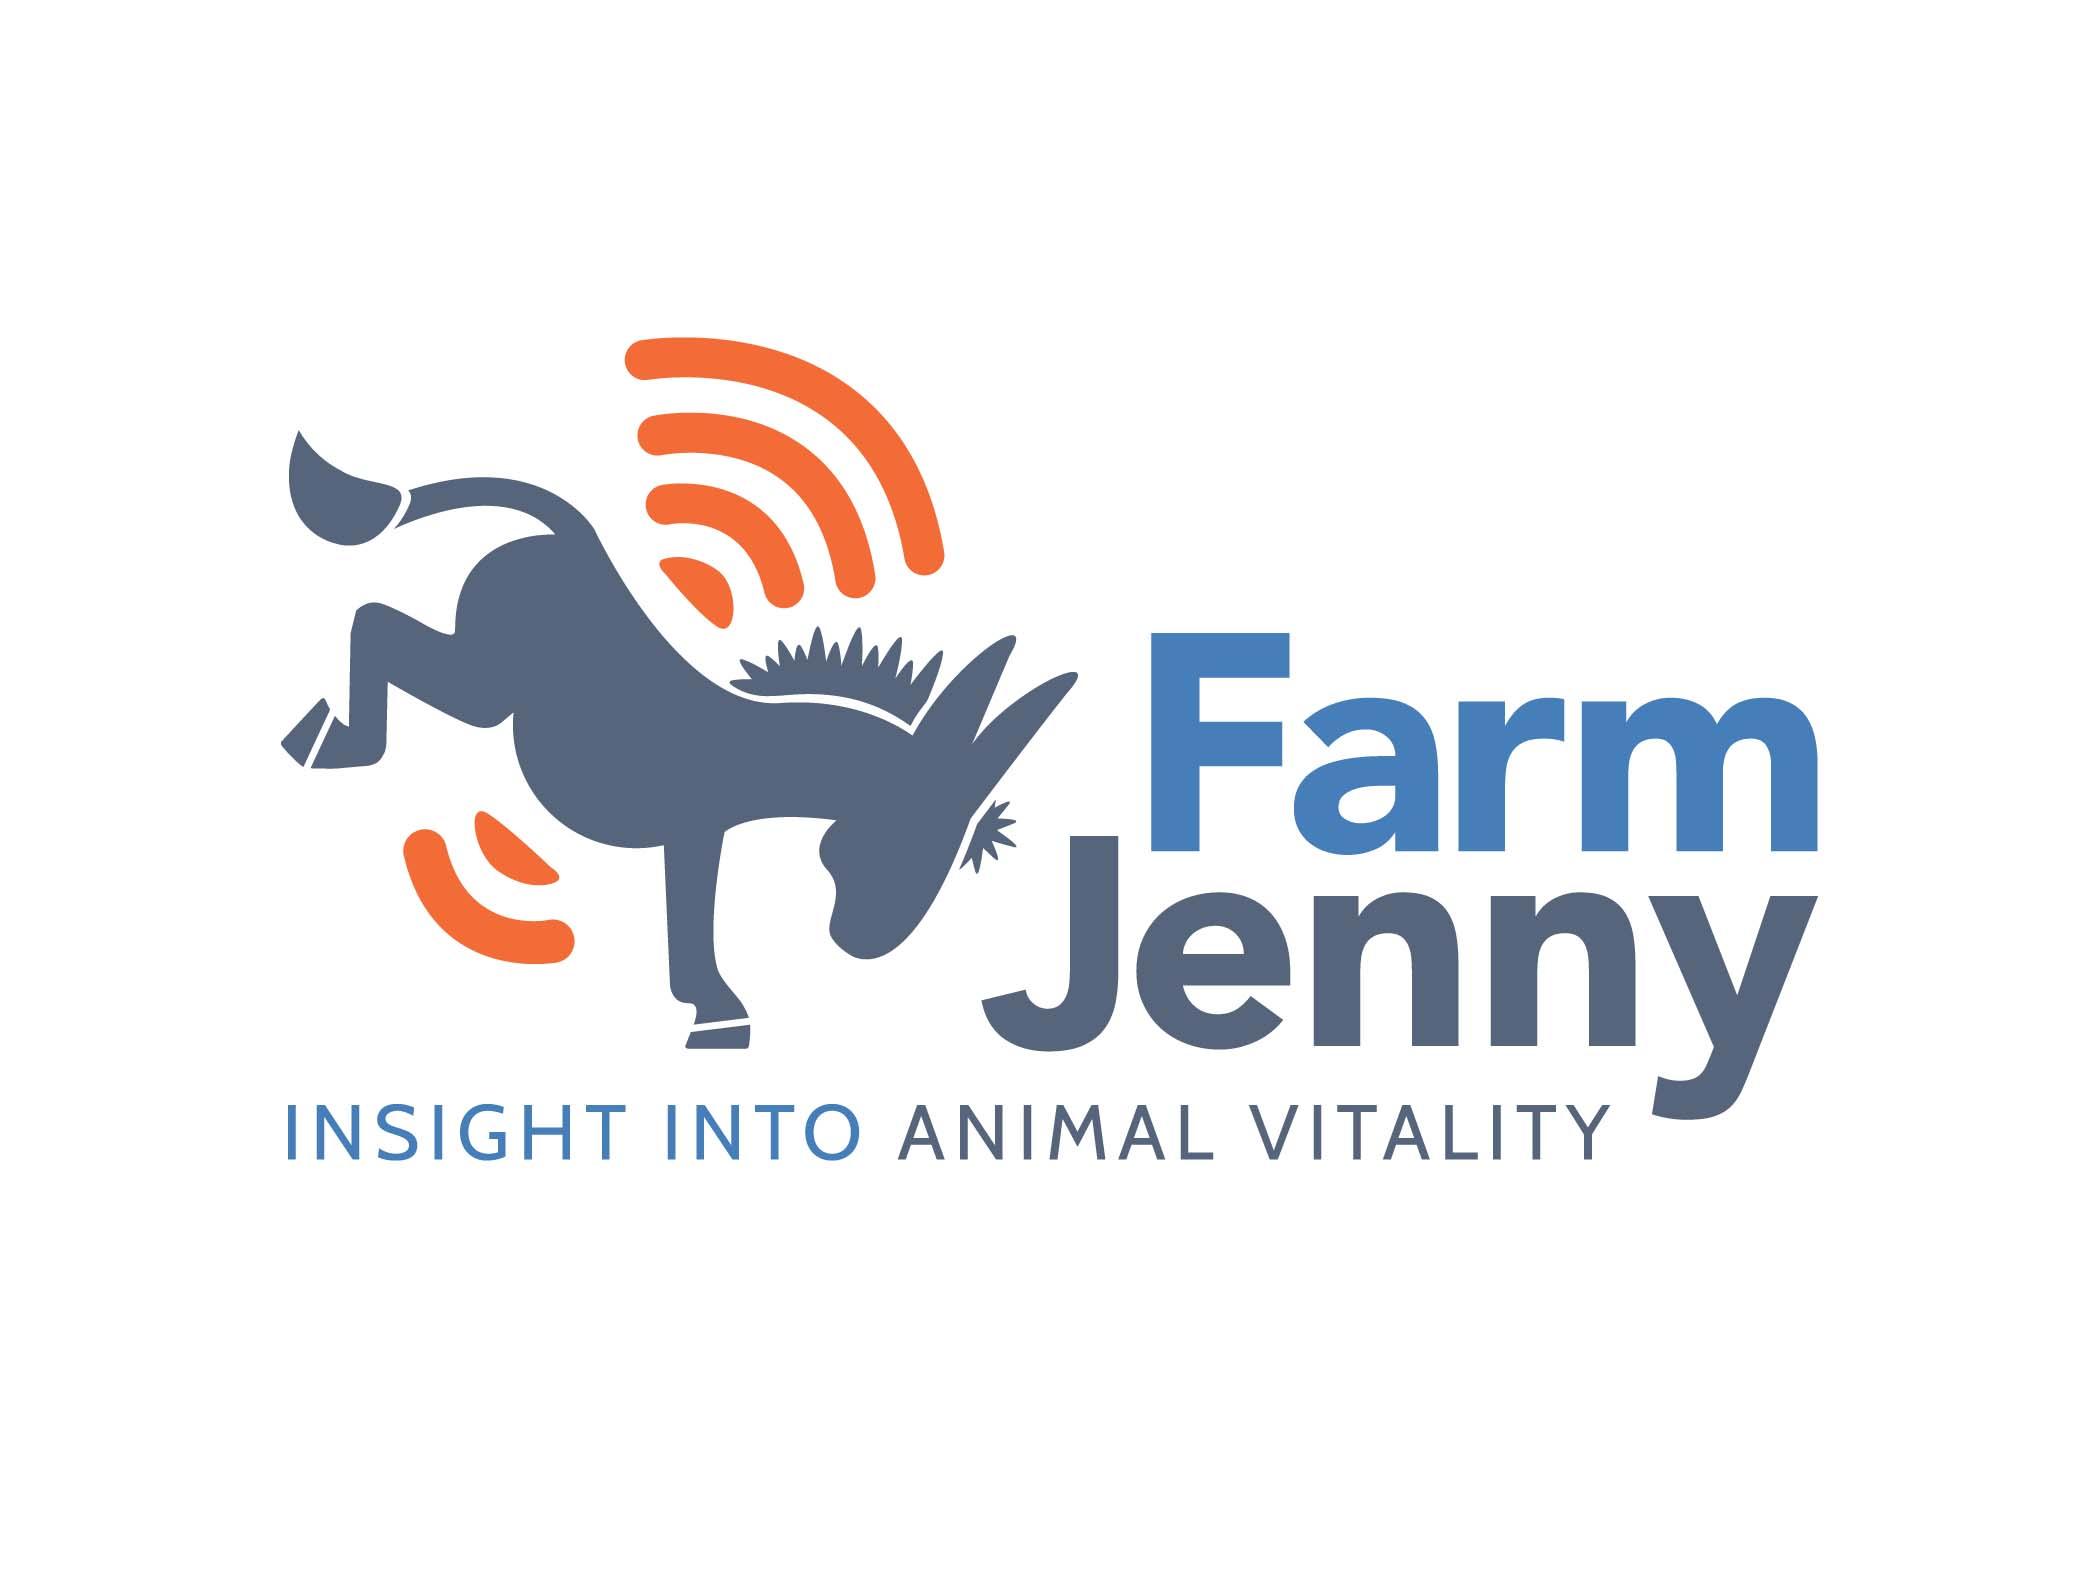 FARM JENNY LOGO 2.jpg